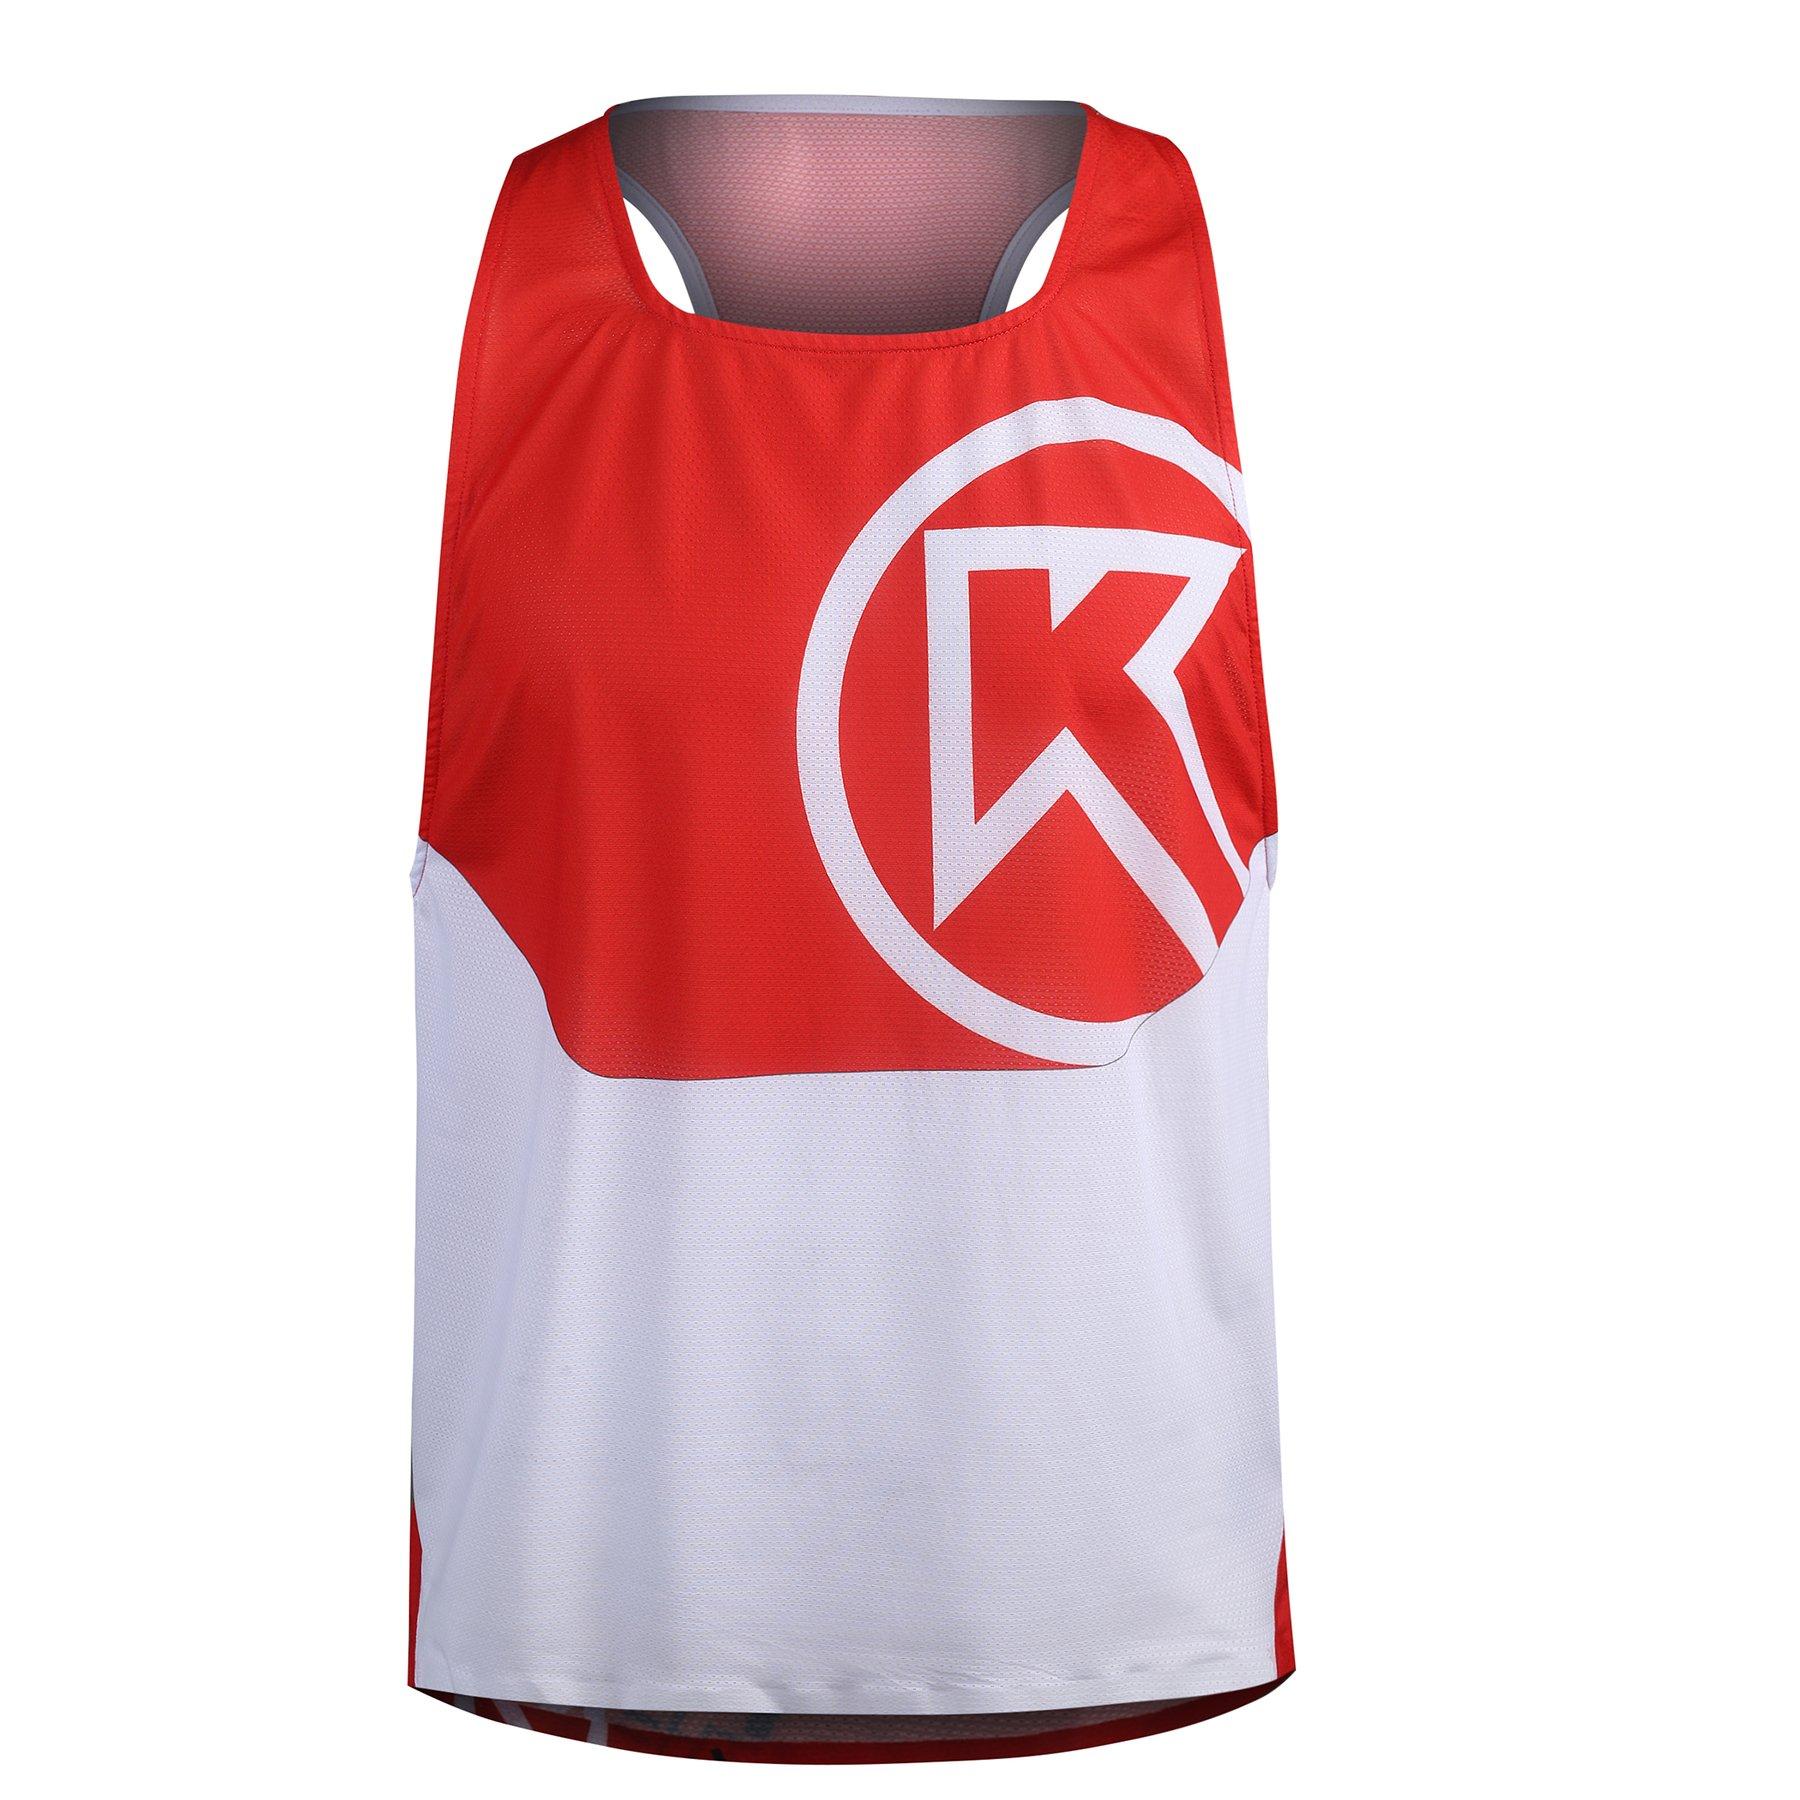 201025002 t shirt isonik maratona vermelha fitness, nutrition